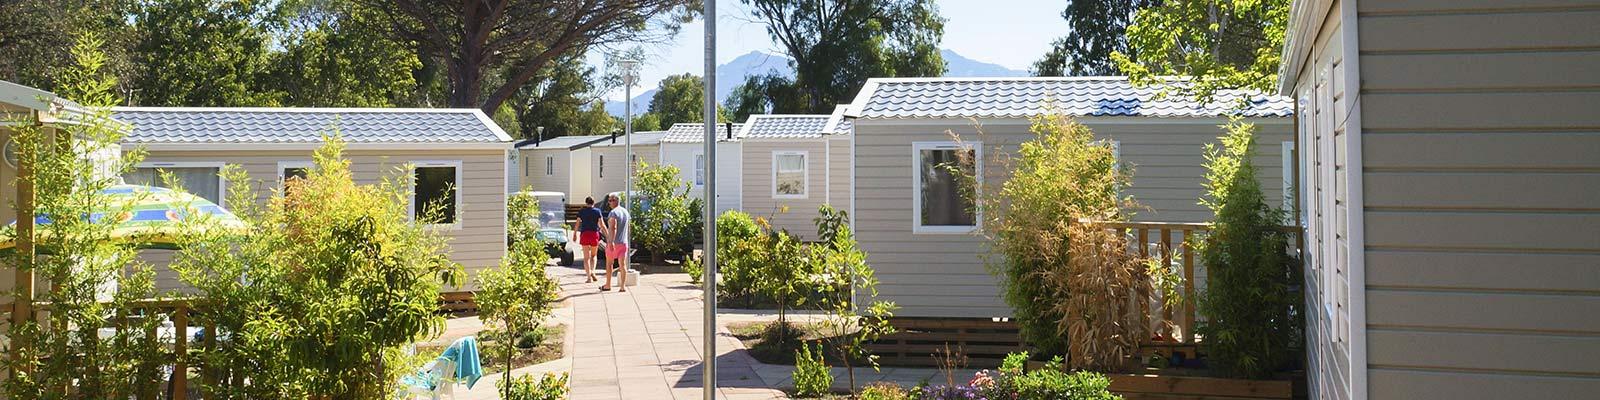 camping a calvi avec mobile homes